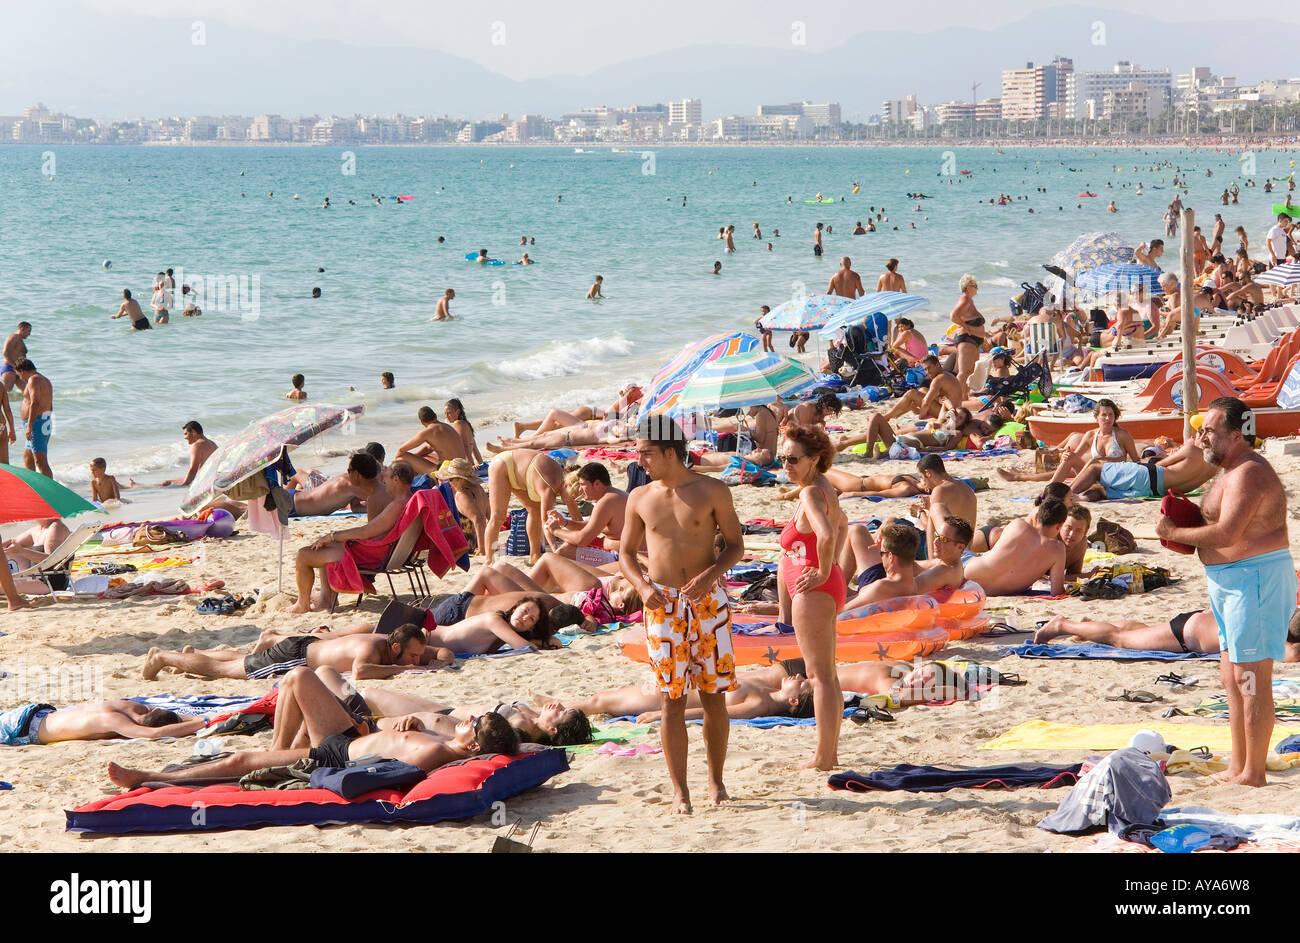 Big hustle on the Playa de Palma Beach, El Arenal, Majorca, Balearic Islands, Spain Stock Photo